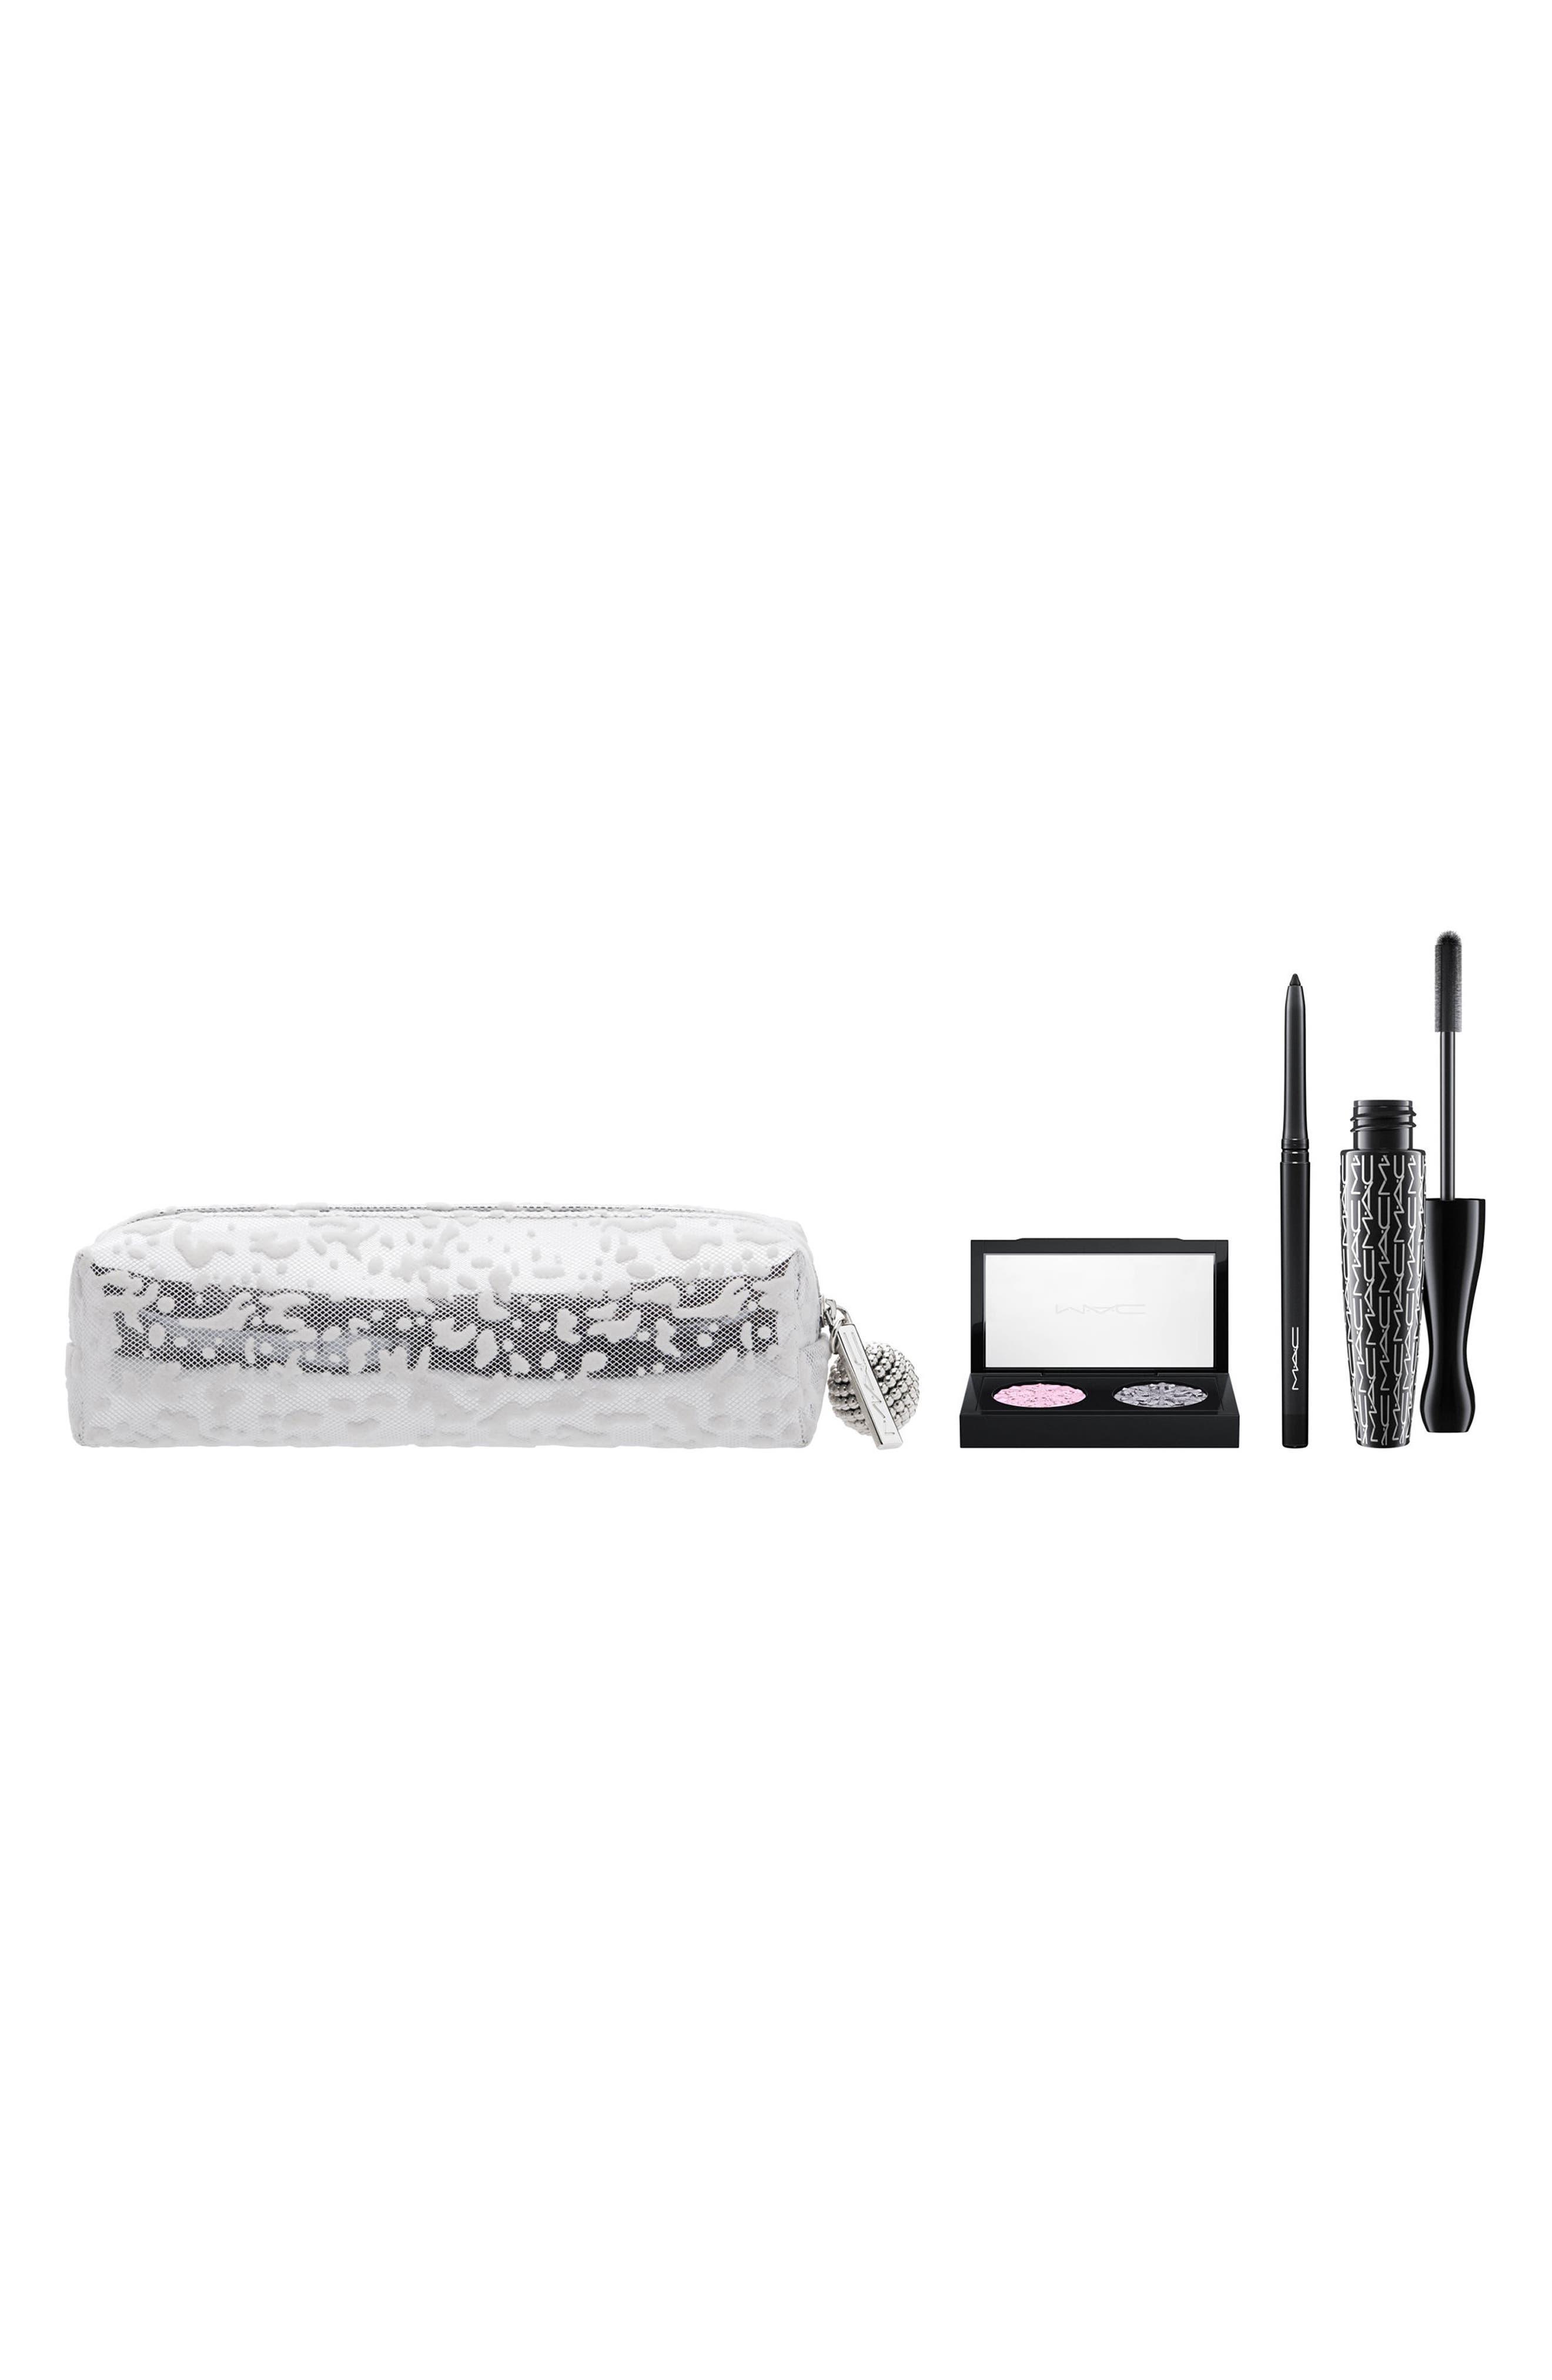 MAC Snow Ball Smoky Pink Eye Bag ($72.50 Value)